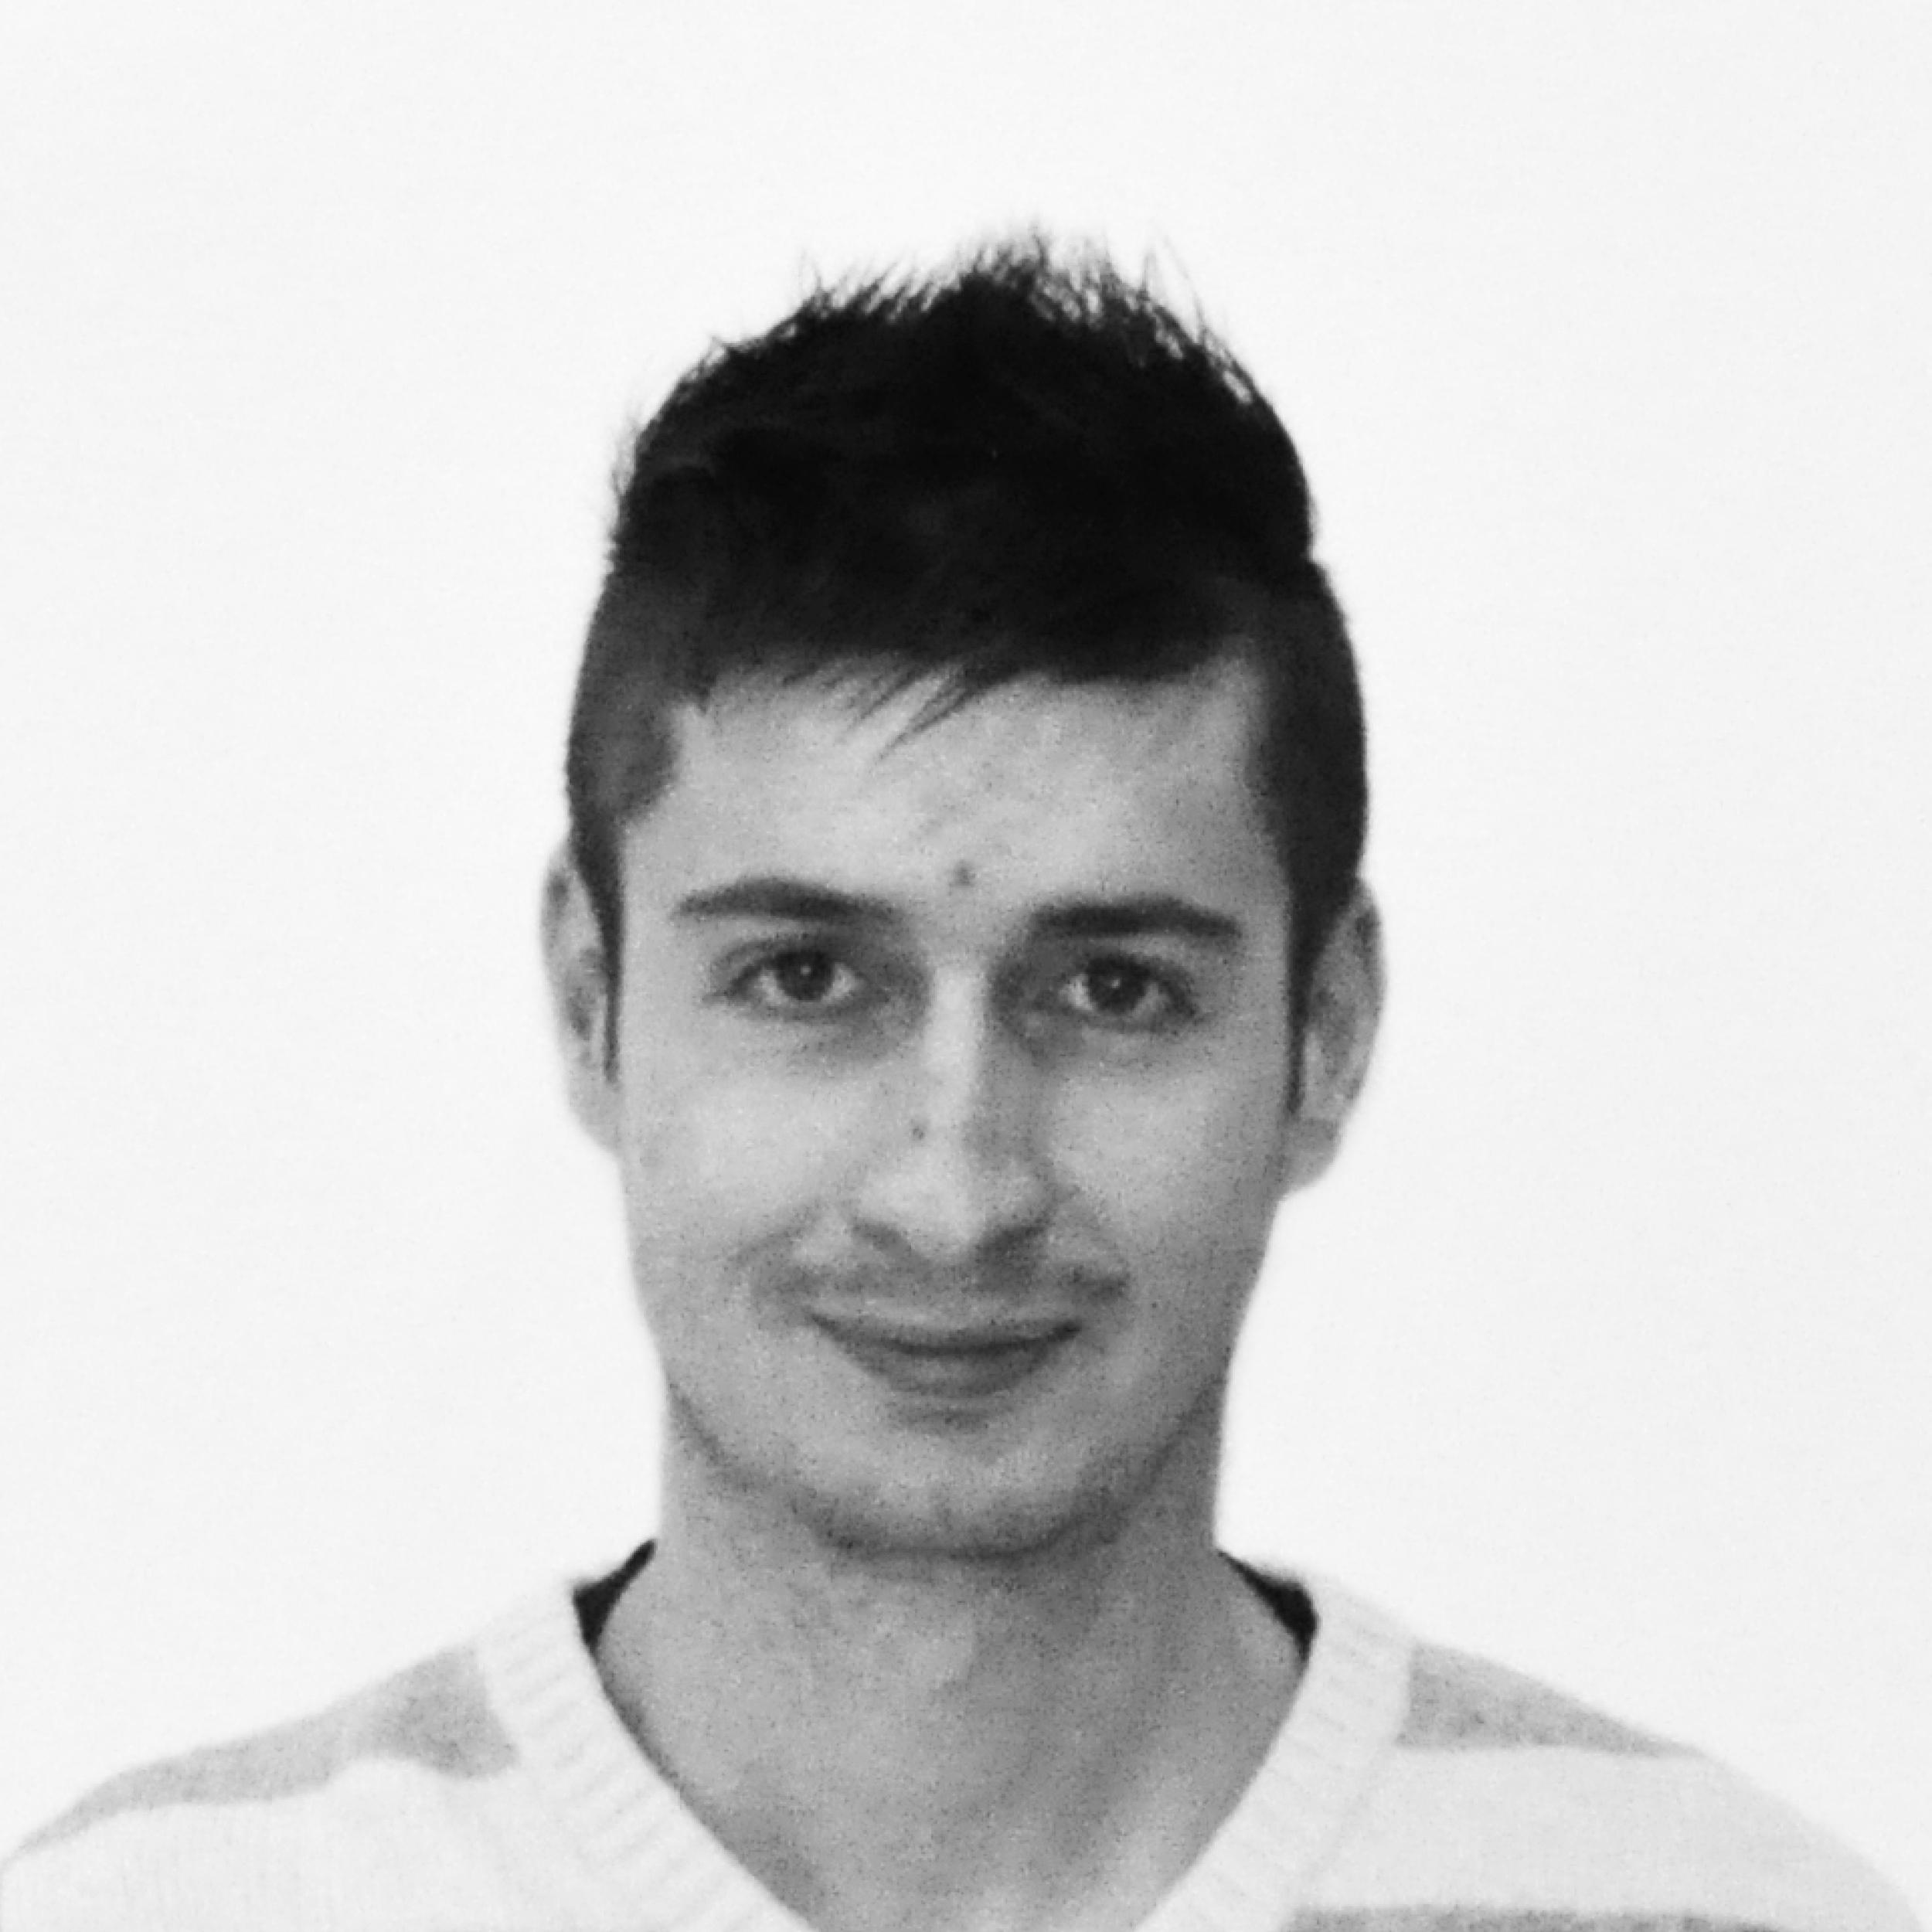 pietro_pacinelli